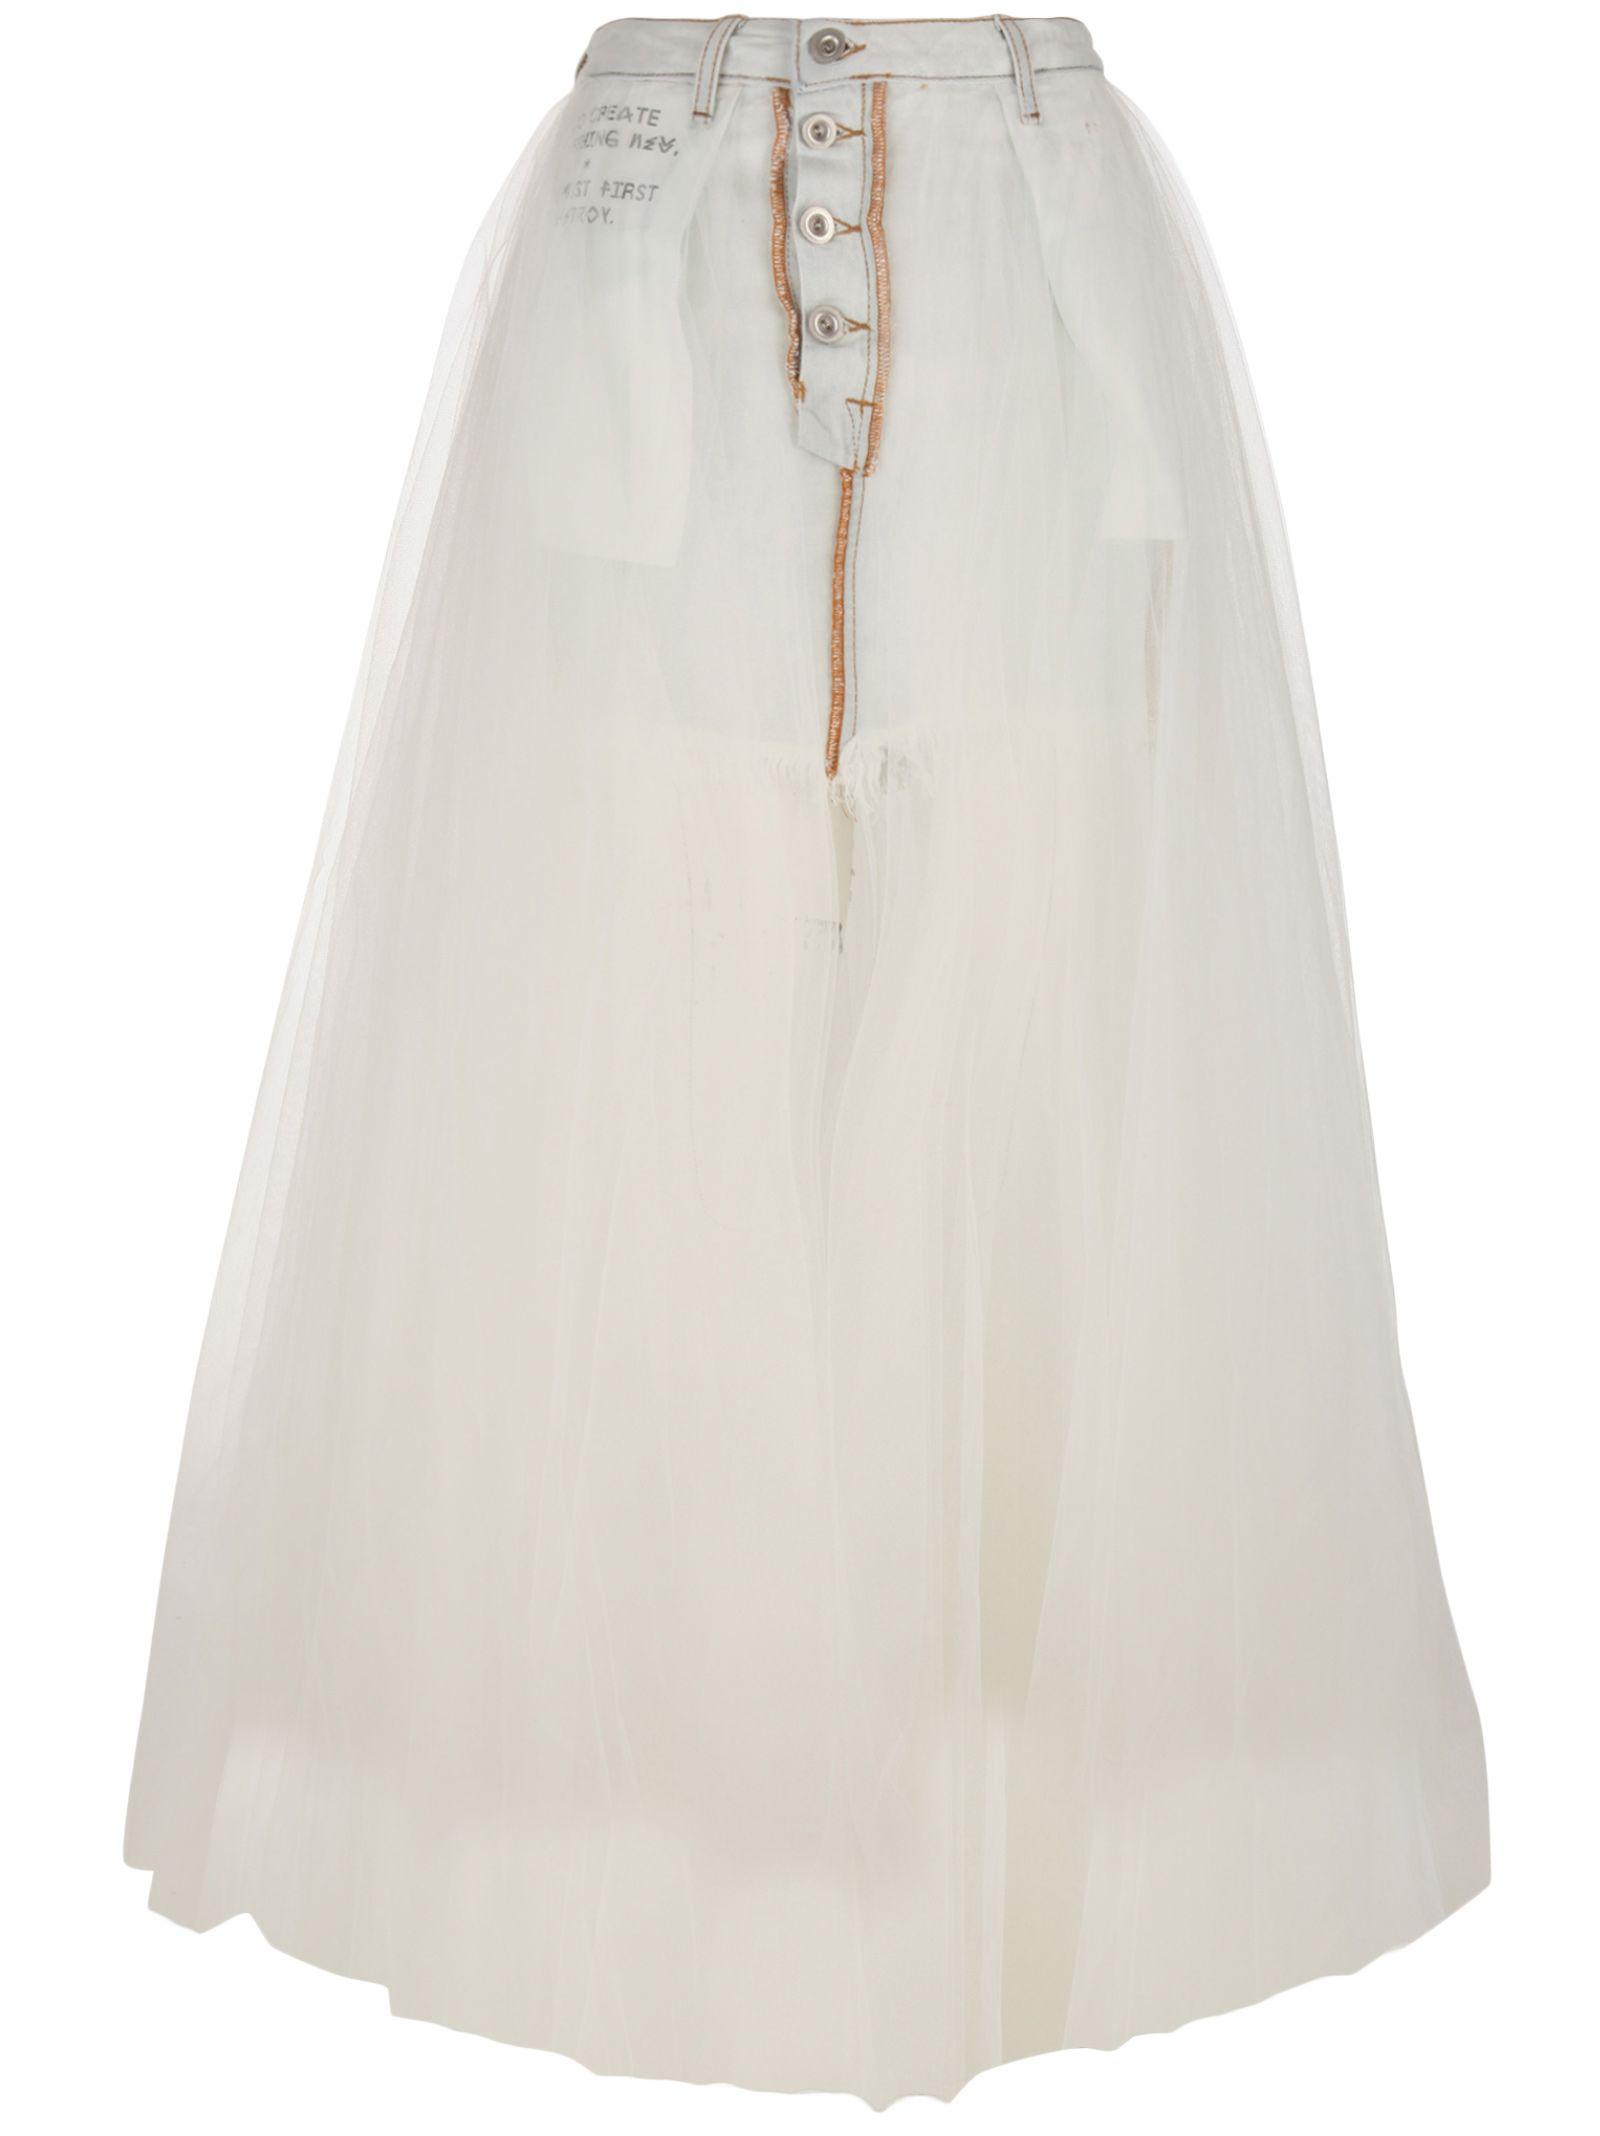 162f2de370 Ben Taverniti Unravel Project Skirt In White